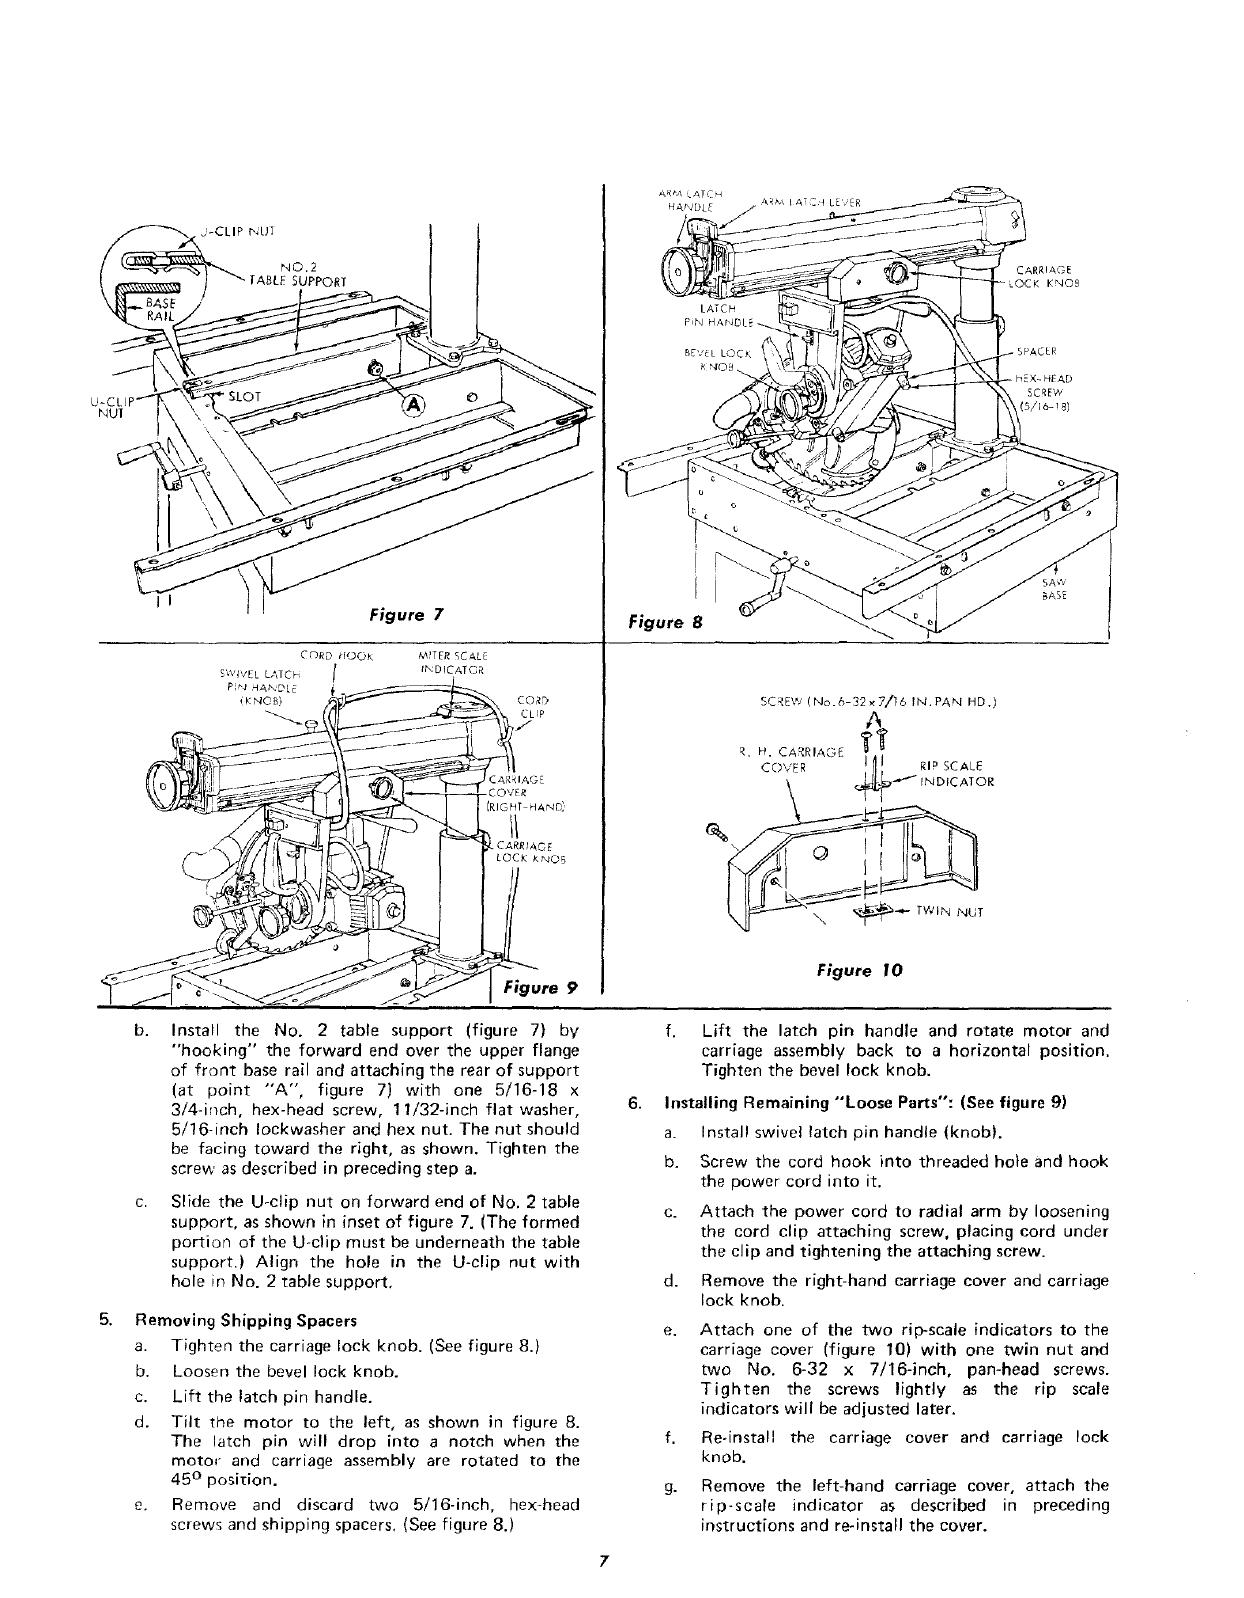 Craftsman 11323301 User Manual 12 IN RADIAL SAW Manuals